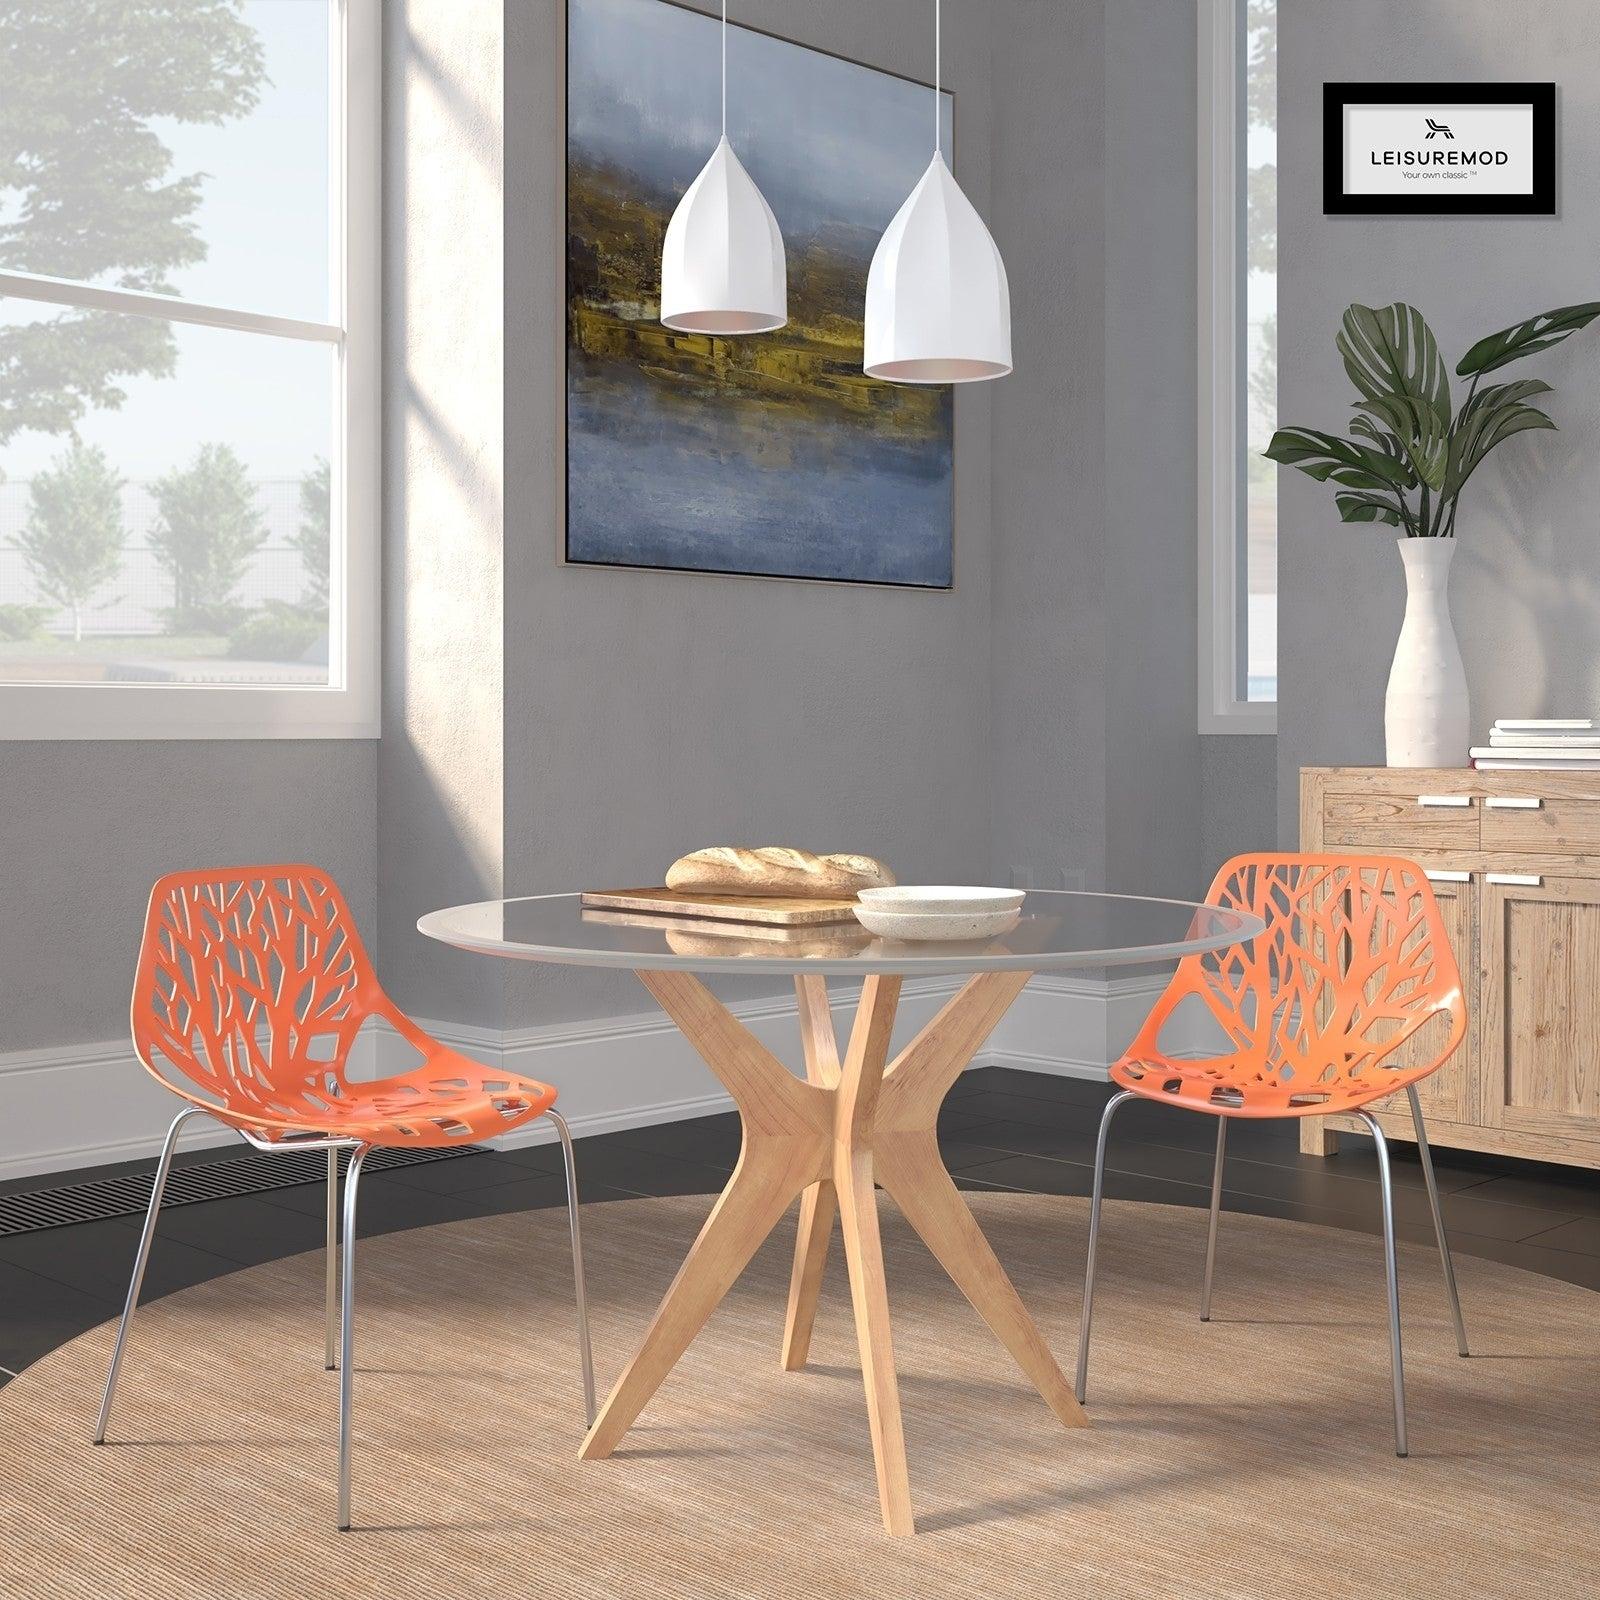 Leisuremod Asbury Orange Open Back Chrome Dining Side Chair Set Of 2 Regarding Asbury Club Chairs (View 14 of 15)